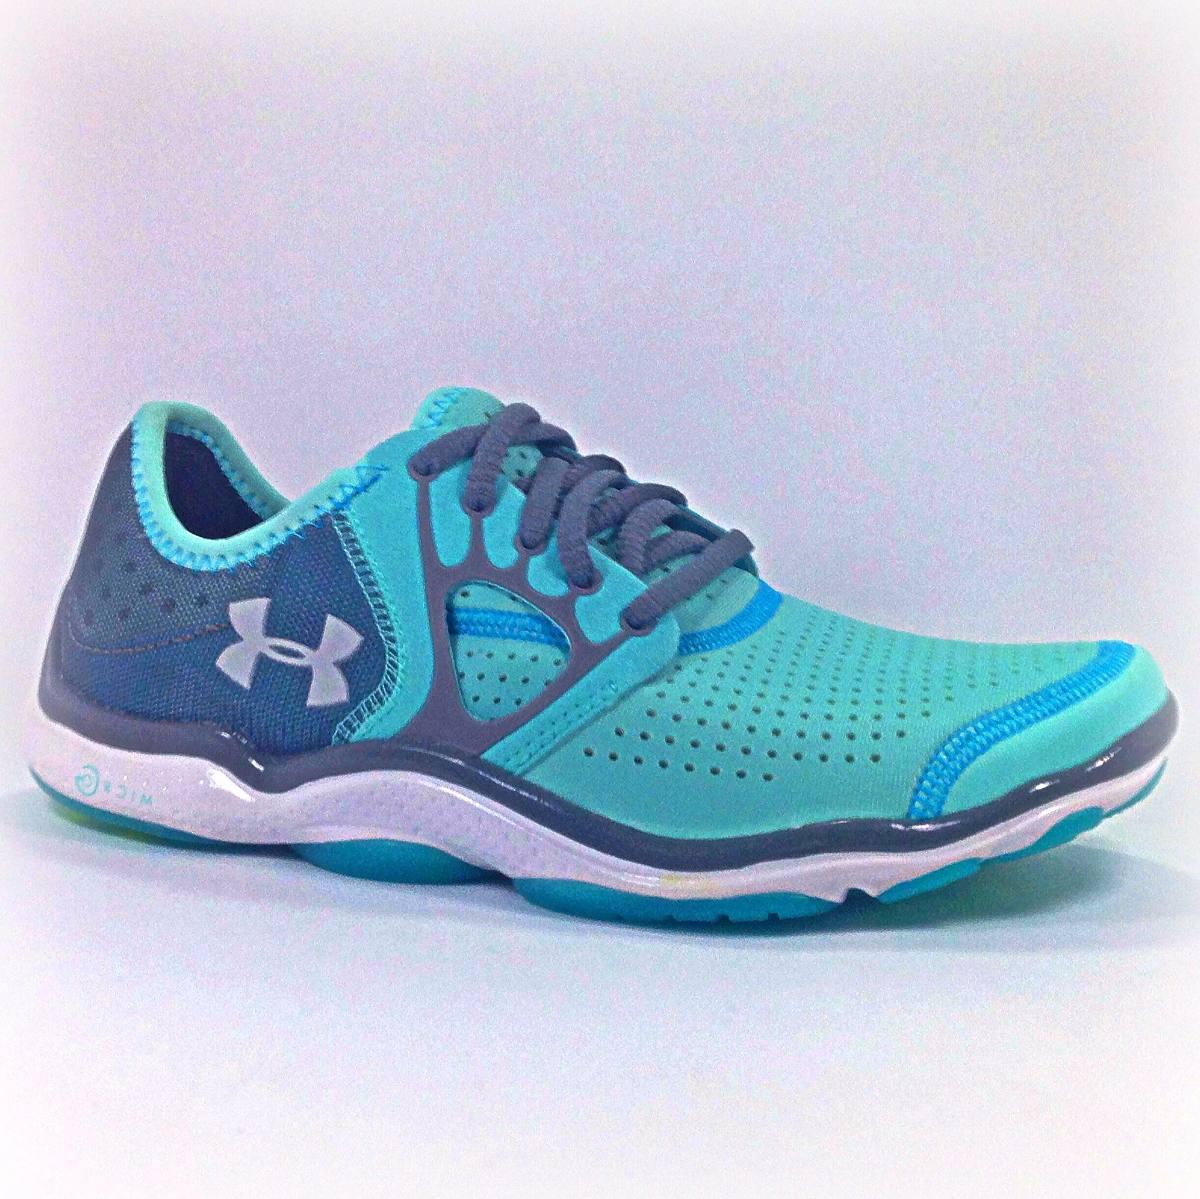 Zapatos Under Armour para mujer 3kEVNYwq